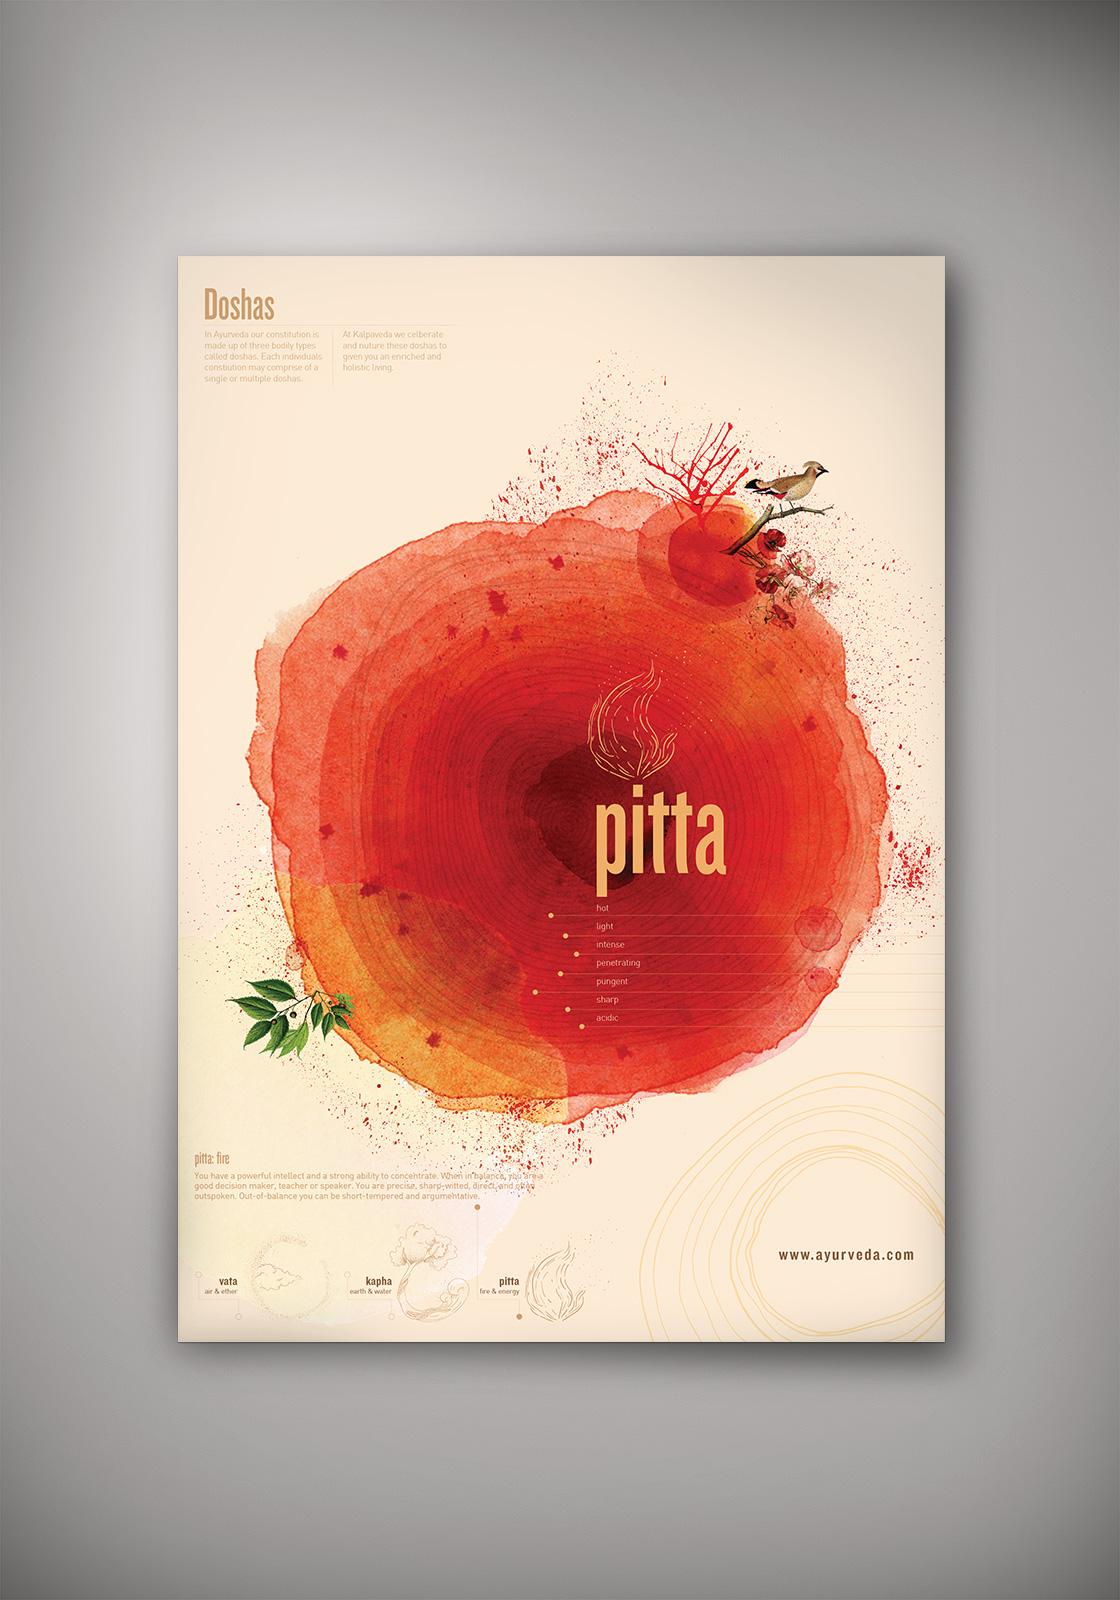 pitta_kalpaveda-poster